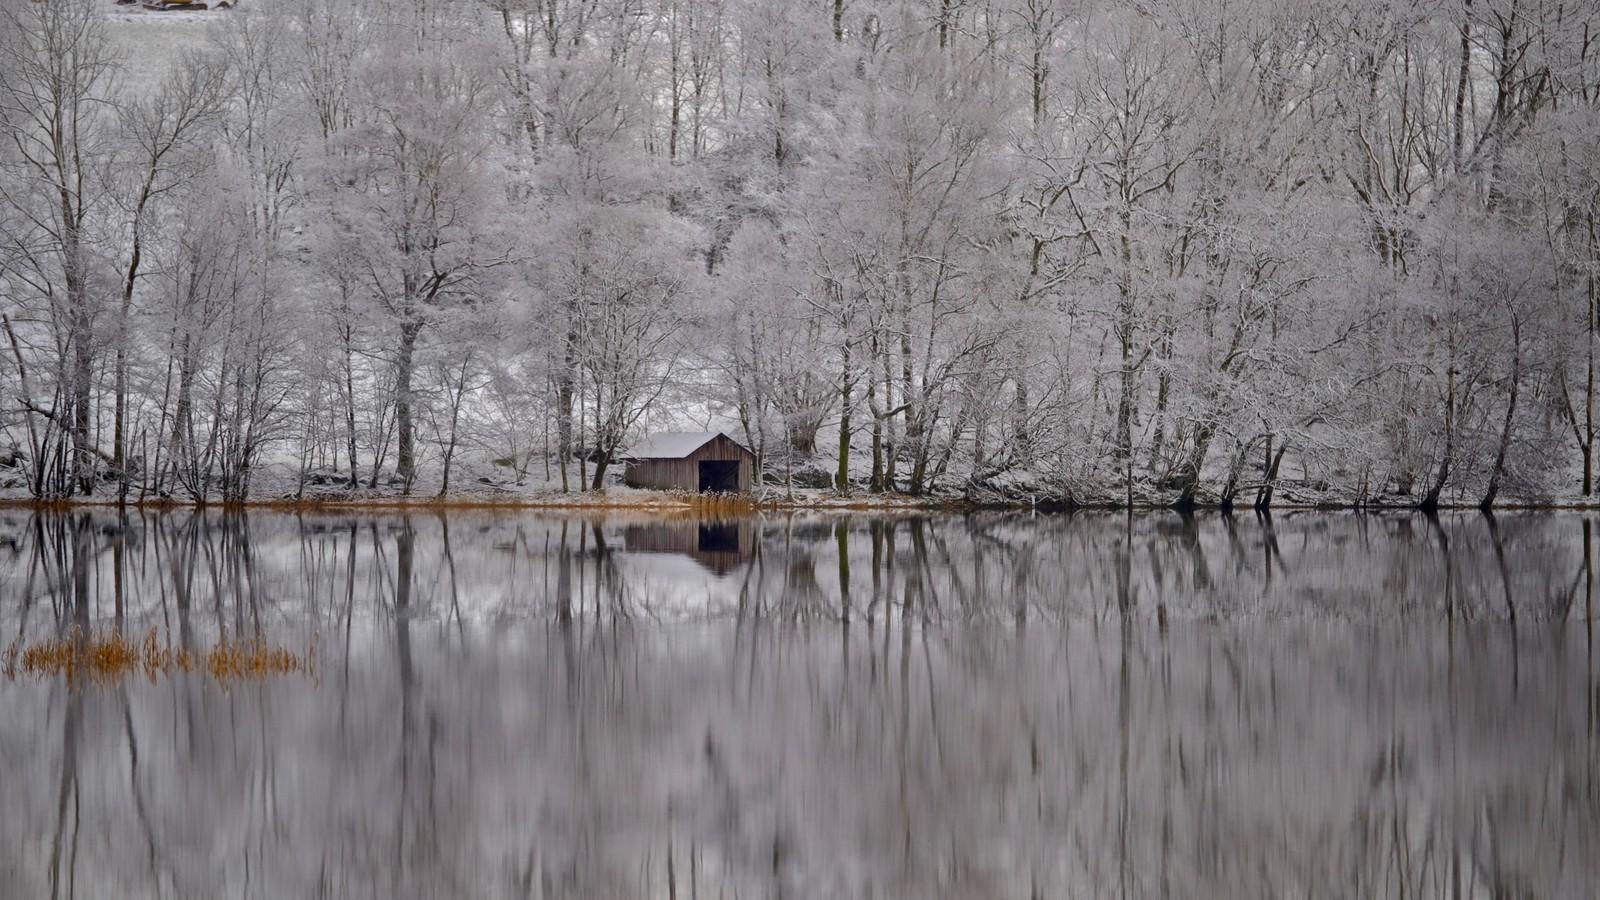 Vatsvatnet i Vindafjord